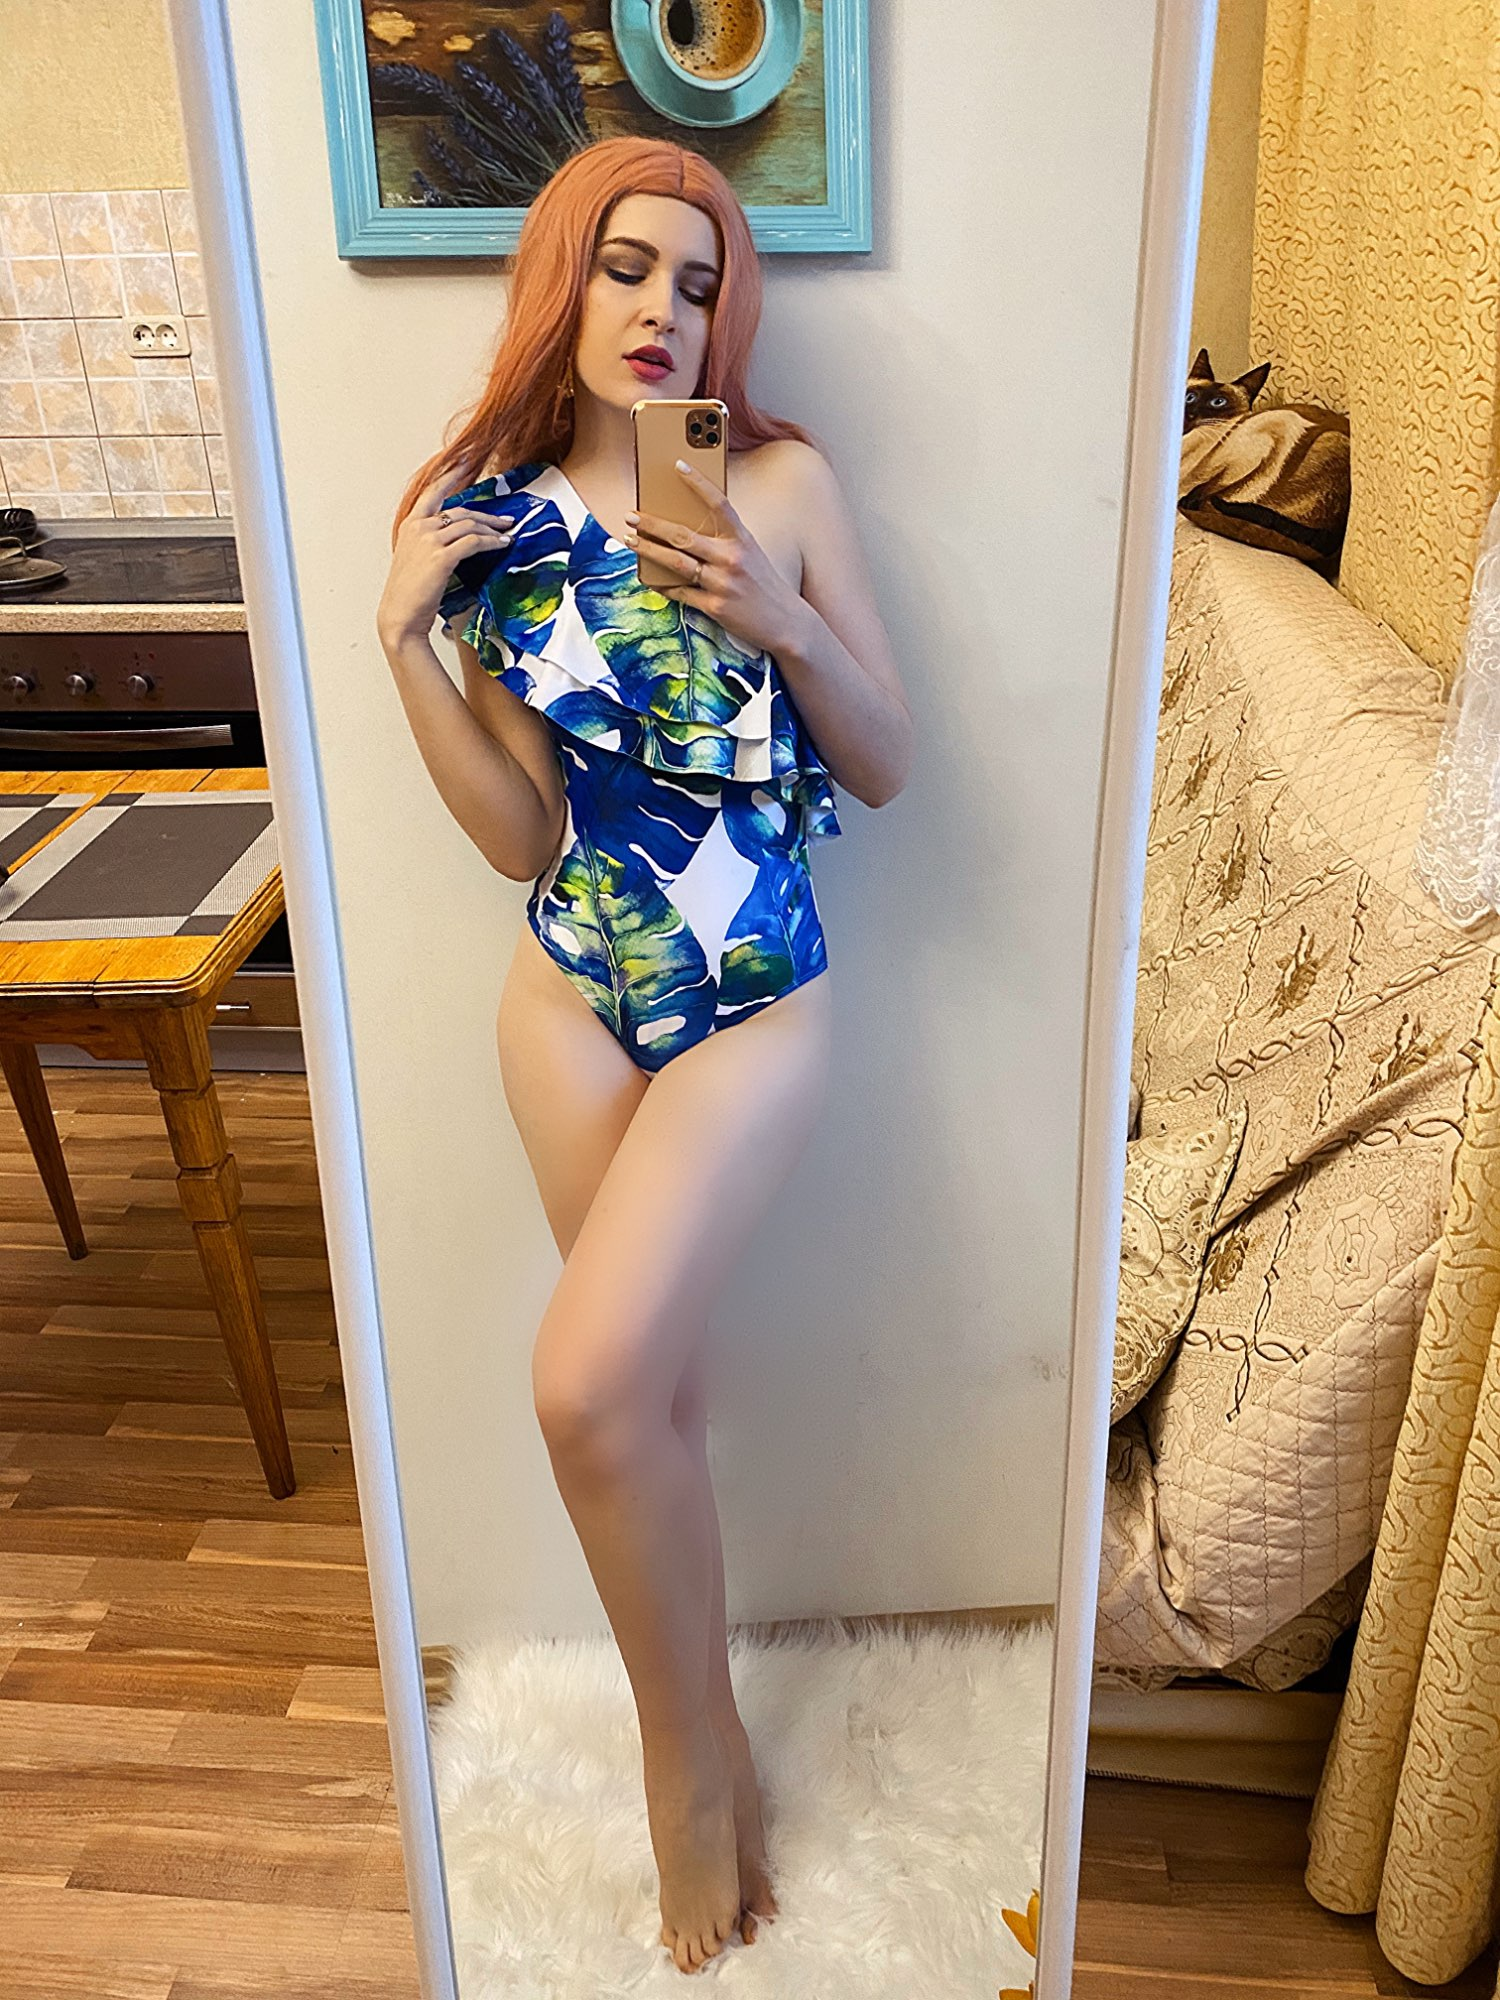 2021 Print Floral One Piece Swimsuit Women Padded Swimwear Bandage Cut Out Mnokini Bathing Suit Plus Size Swimwear XL|Body Suits|   - AliExpress